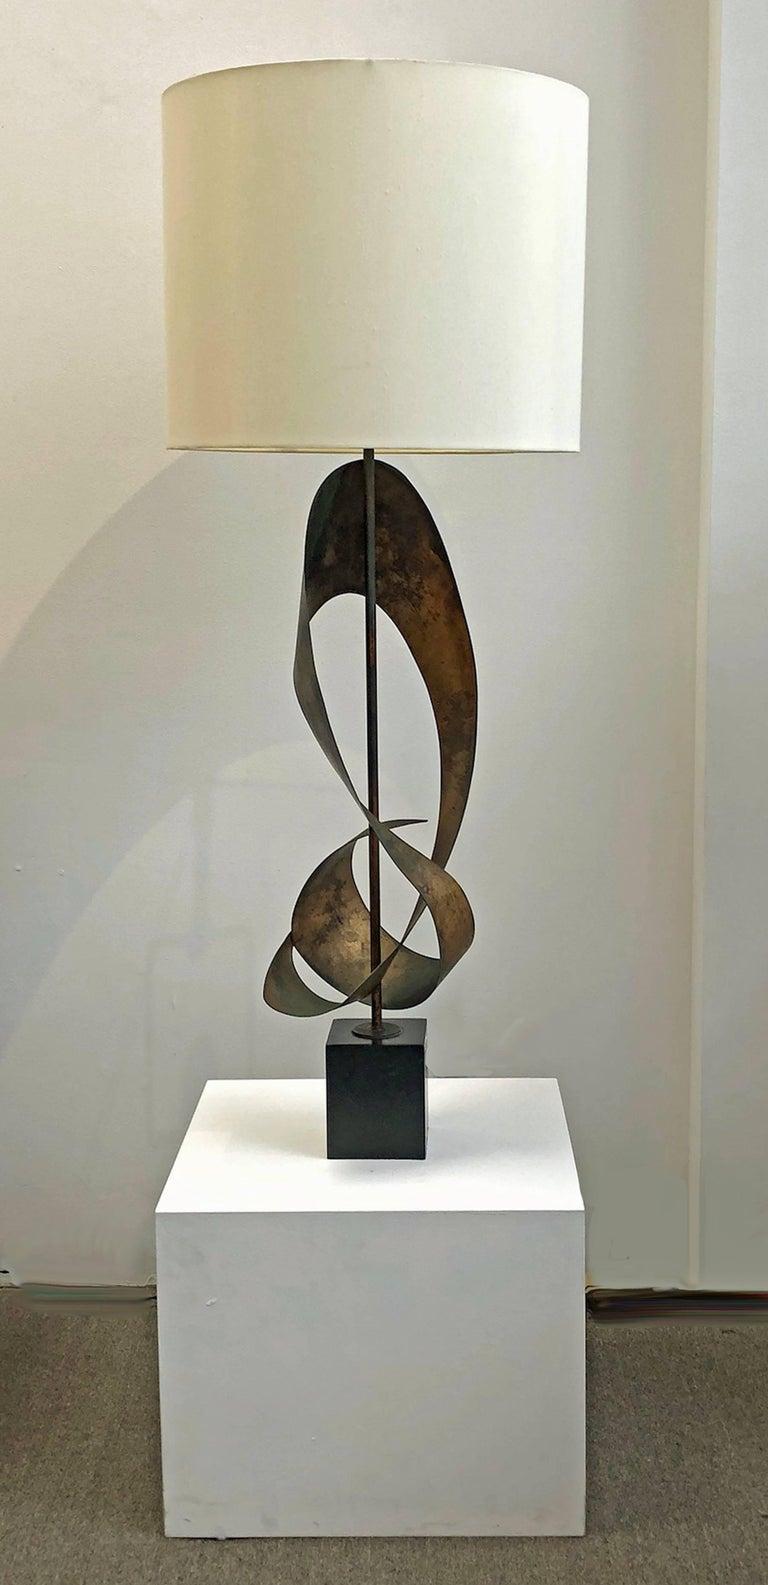 Brutalist sculpture table lamp designed by Harry Balmer for Laurel Lamps. As shown, measures 51